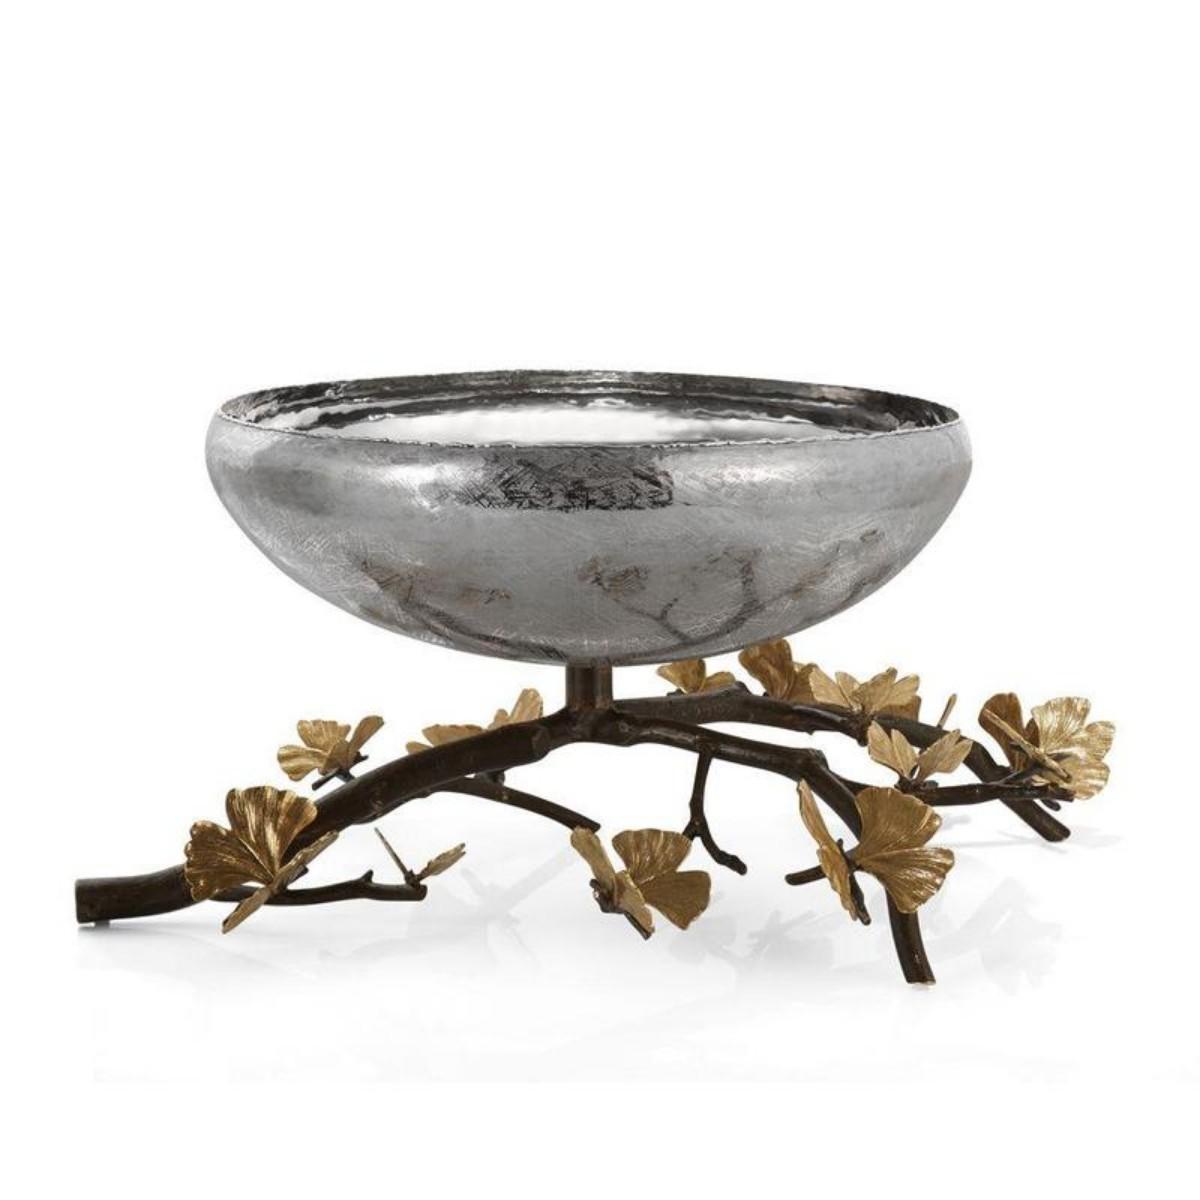 Michael Aram I Butterfly Ginkgo Large Centerpiece Bowl